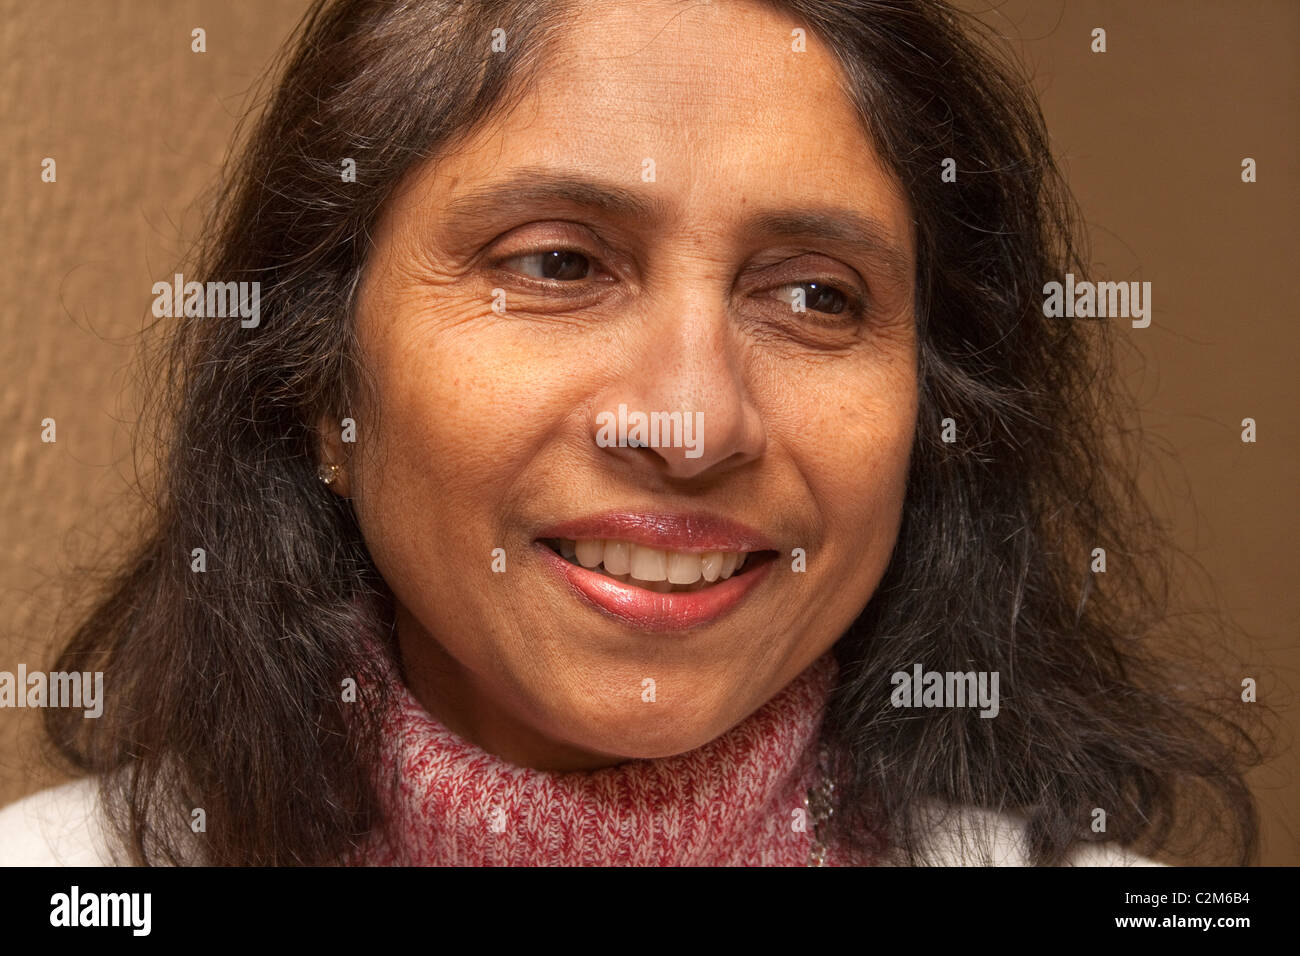 Bella East Indian donna sorridente età 55. St Paul Minnesota MN USA Immagini Stock